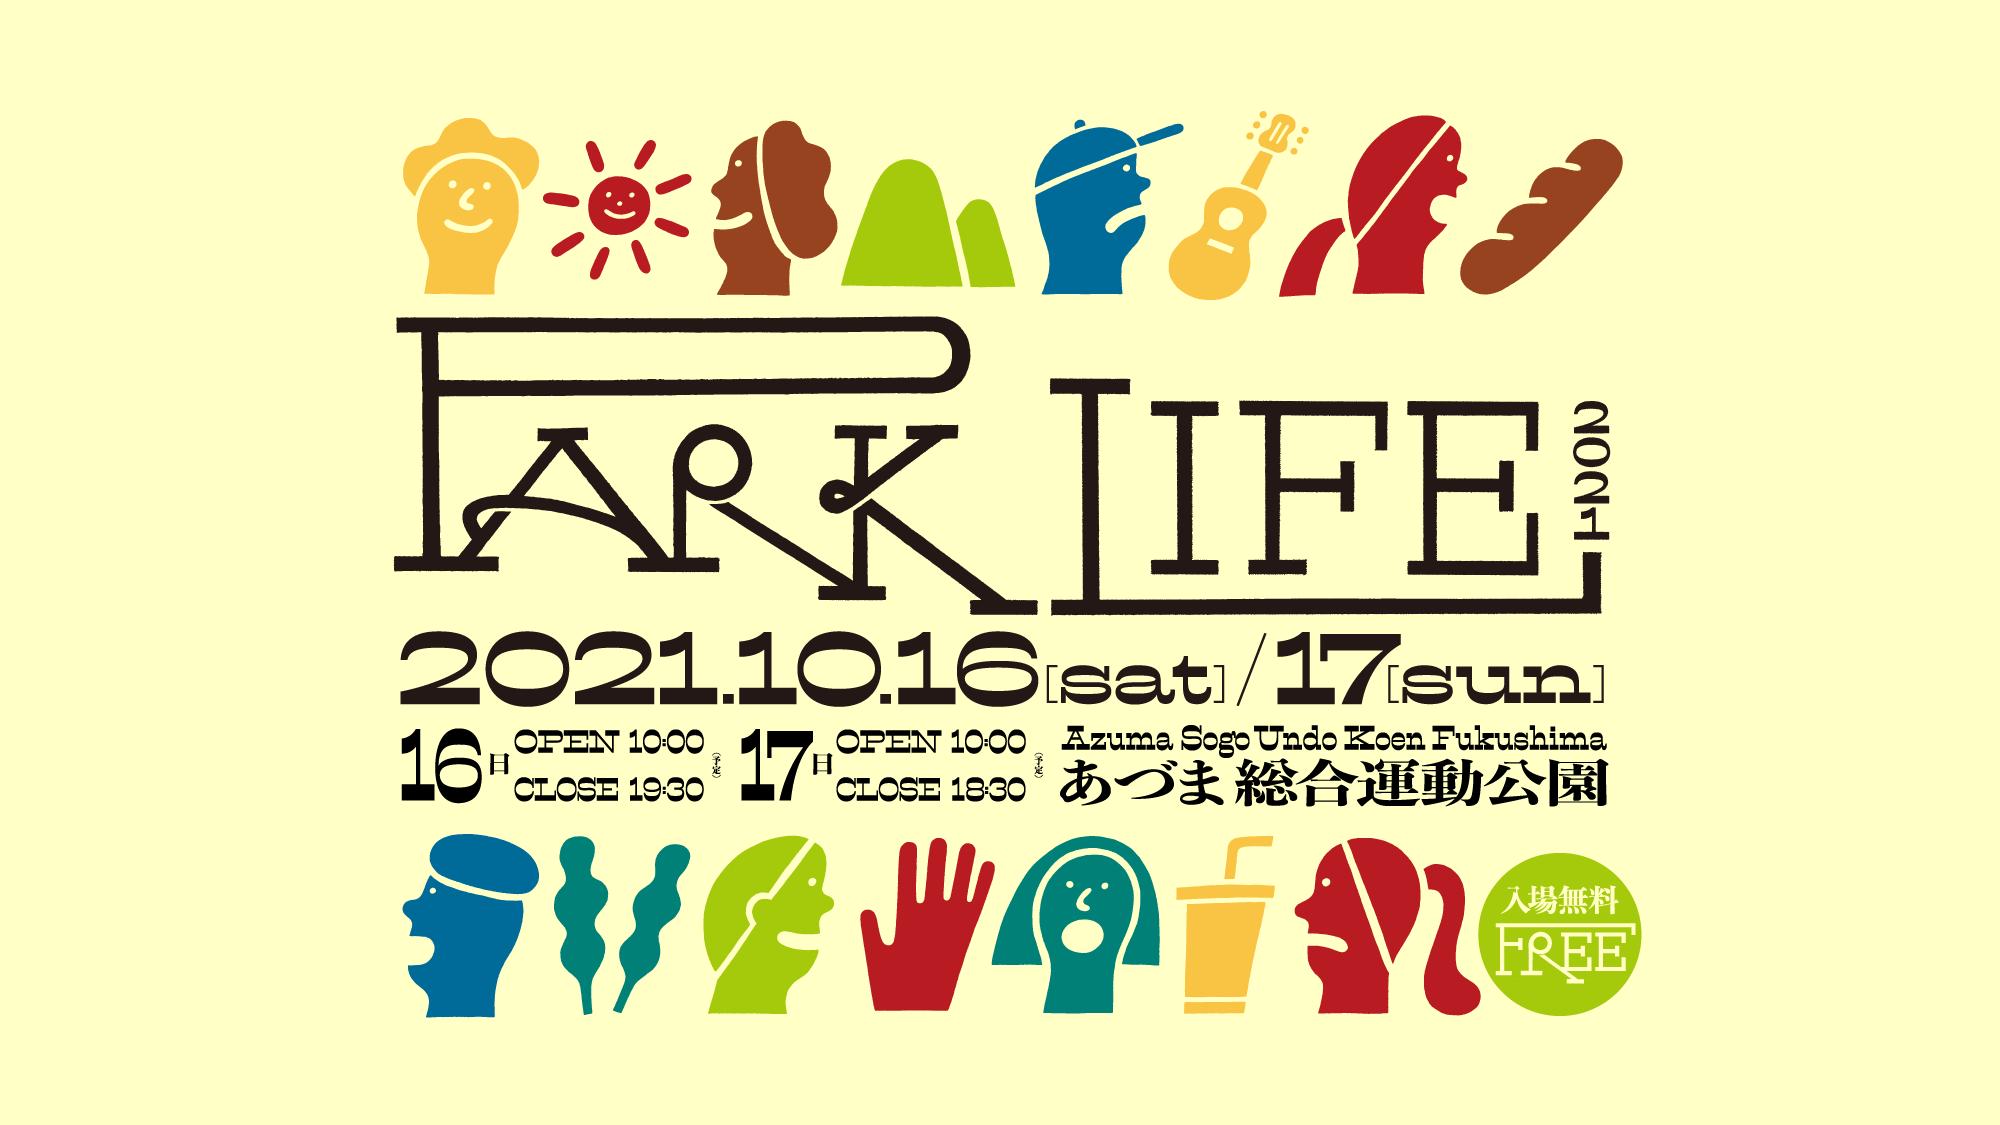 PARK LIFE 2021 | パークライフ2021 | PARK LIFE 2021 | 2021.10.16(SAT) 10:00−19:30 17(SUN) 10:00−18:30 あづま総合運動公園